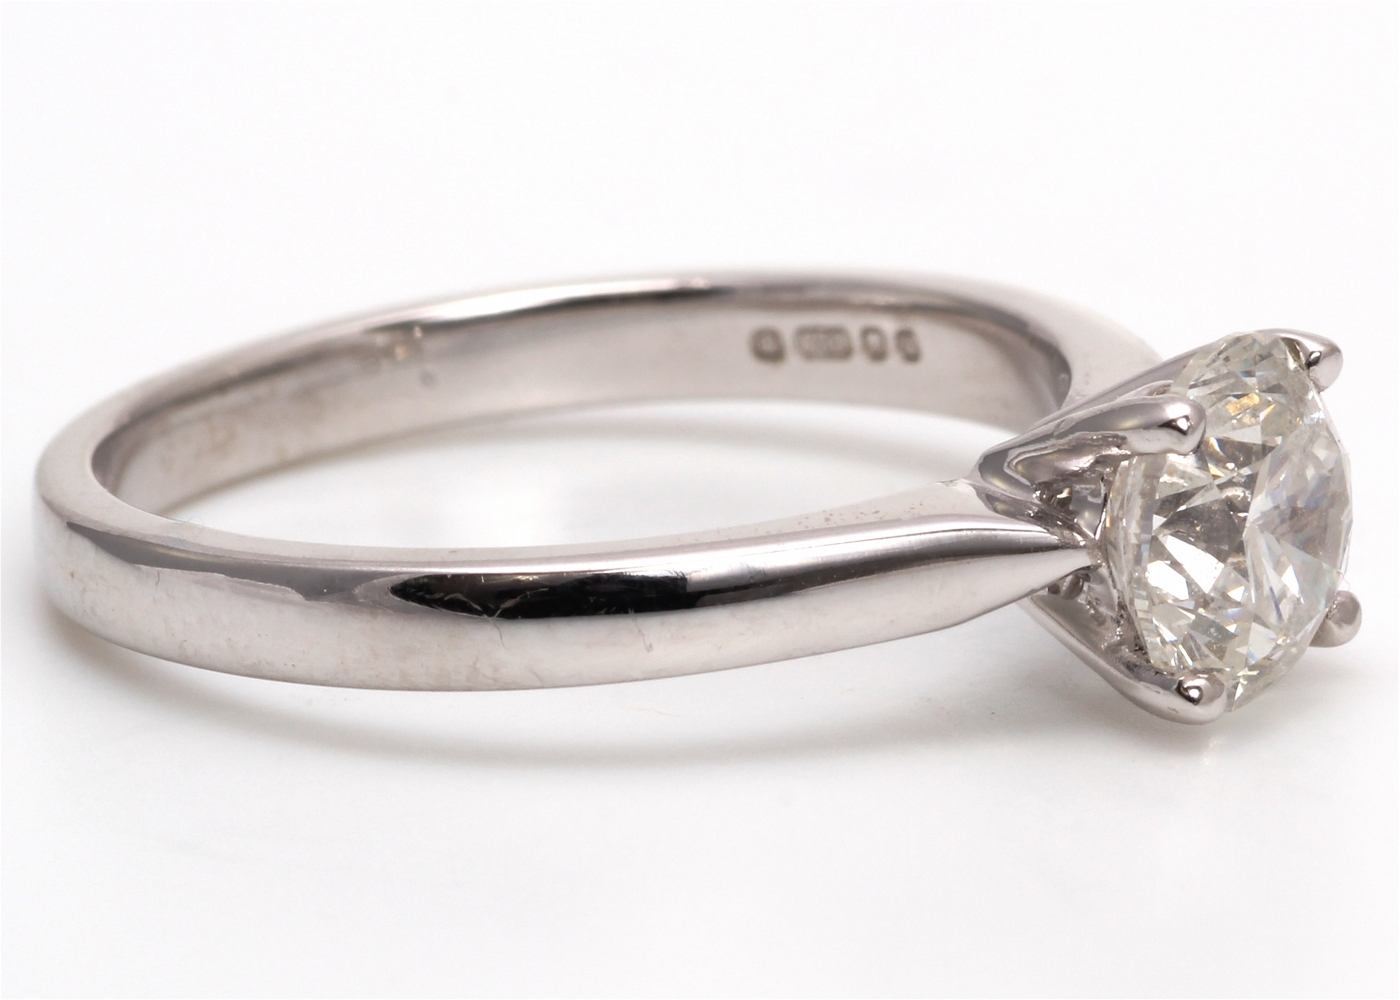 18ct White Gold Single Stone Diamond Ring 1.05 Carats - Image 4 of 4